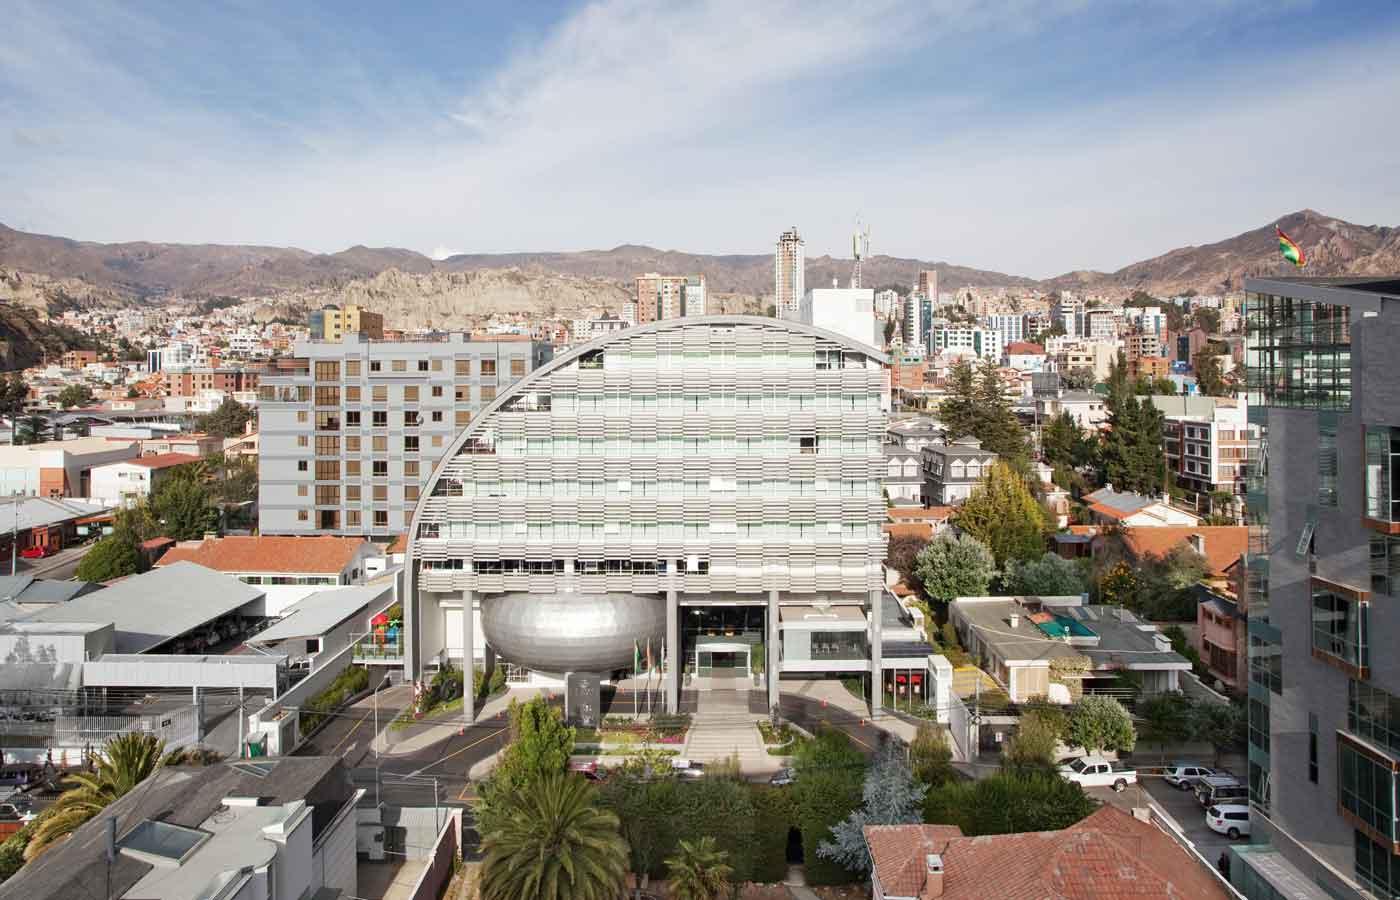 Hotel Casa Grande, La Paz, Bolivia